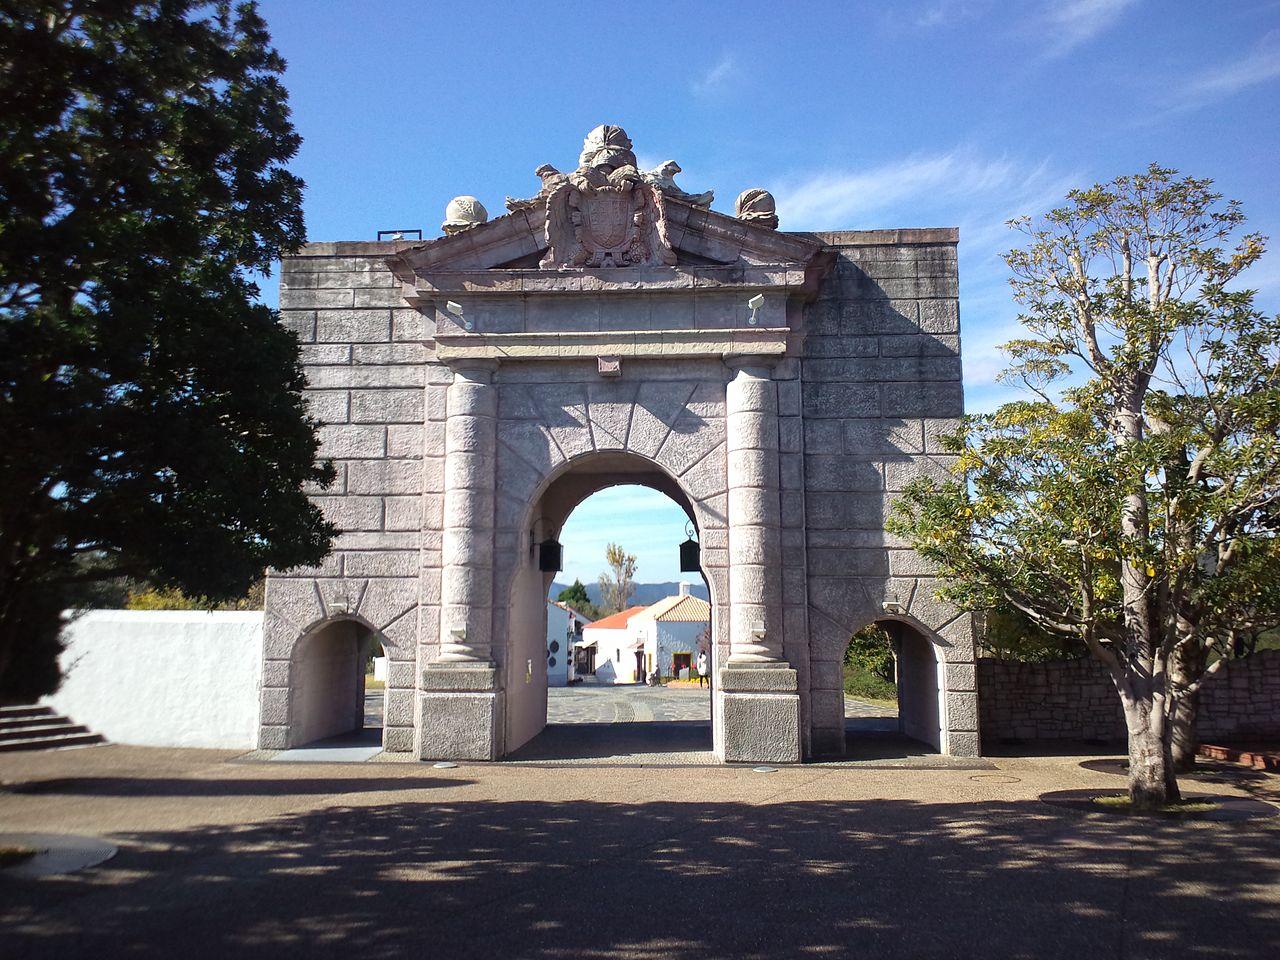 File La Villa Espa Ola De Shima Parque Espa A Puerta De